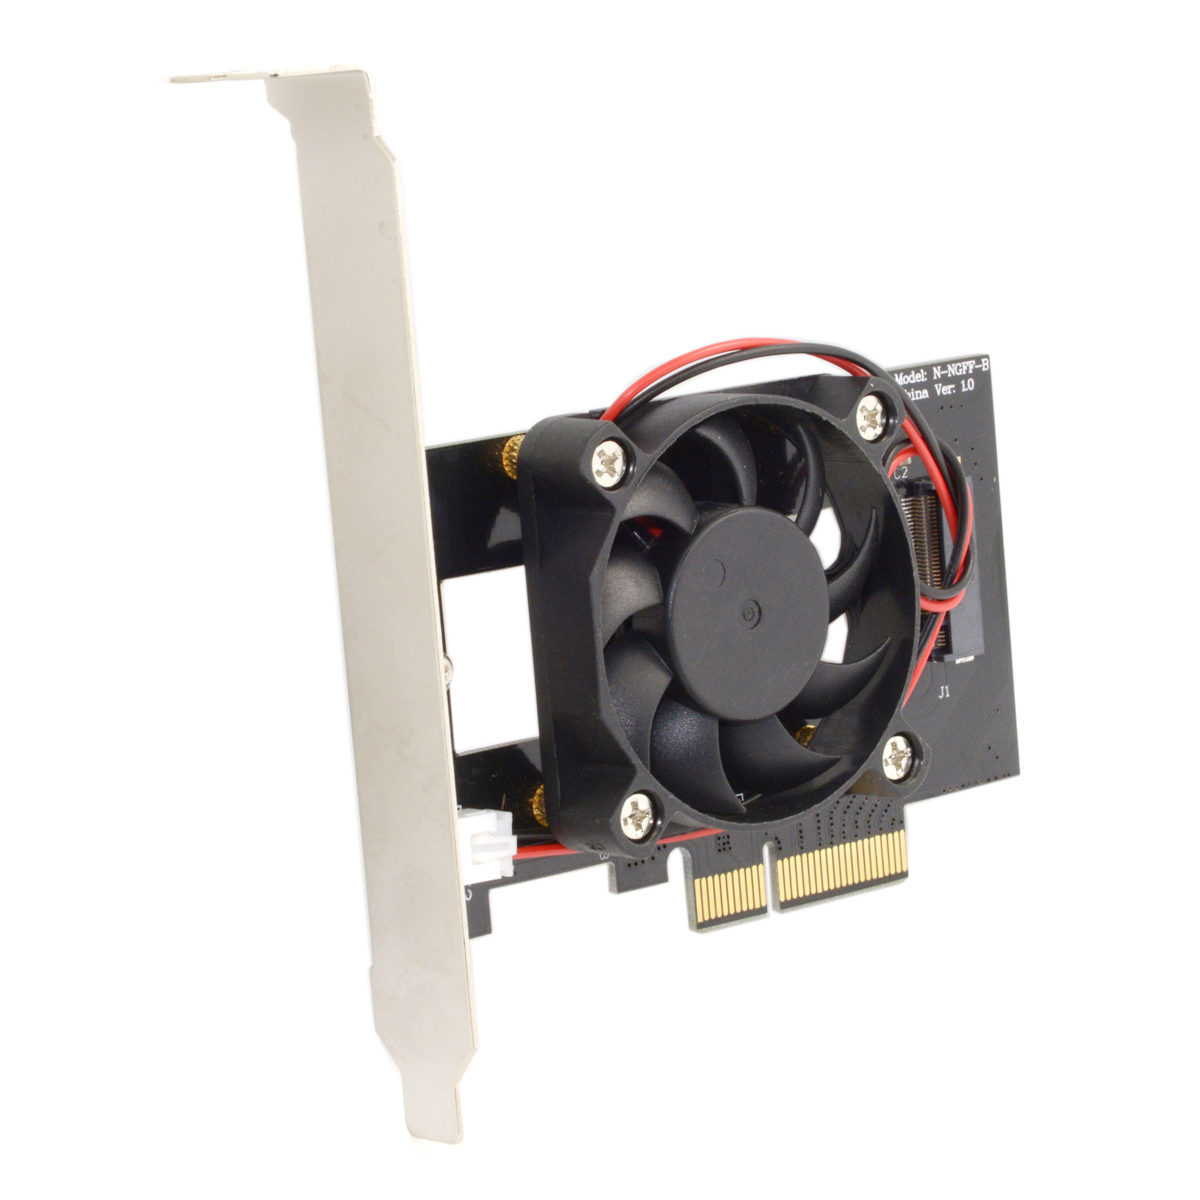 Pci-E 3.0 X4 Lane Host Adapter Converter Card M.2 Ngff M Key Ssd To Nvme+Fan new